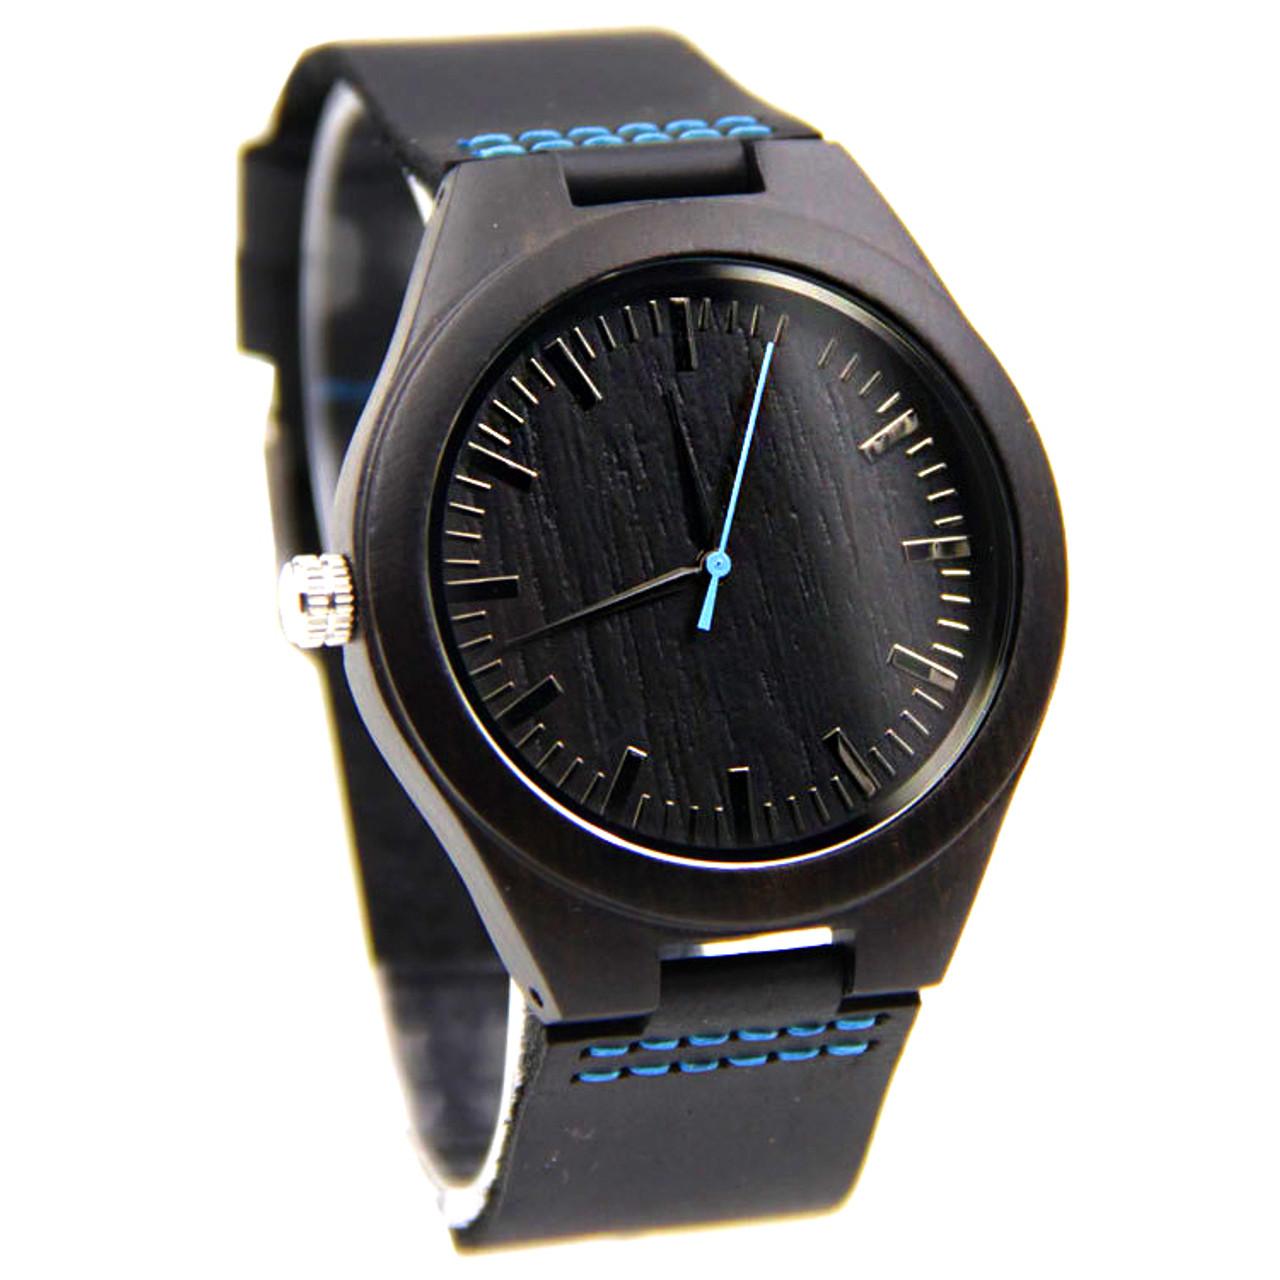 Grpn - Wood Engraved Watch W#83 - Midnight